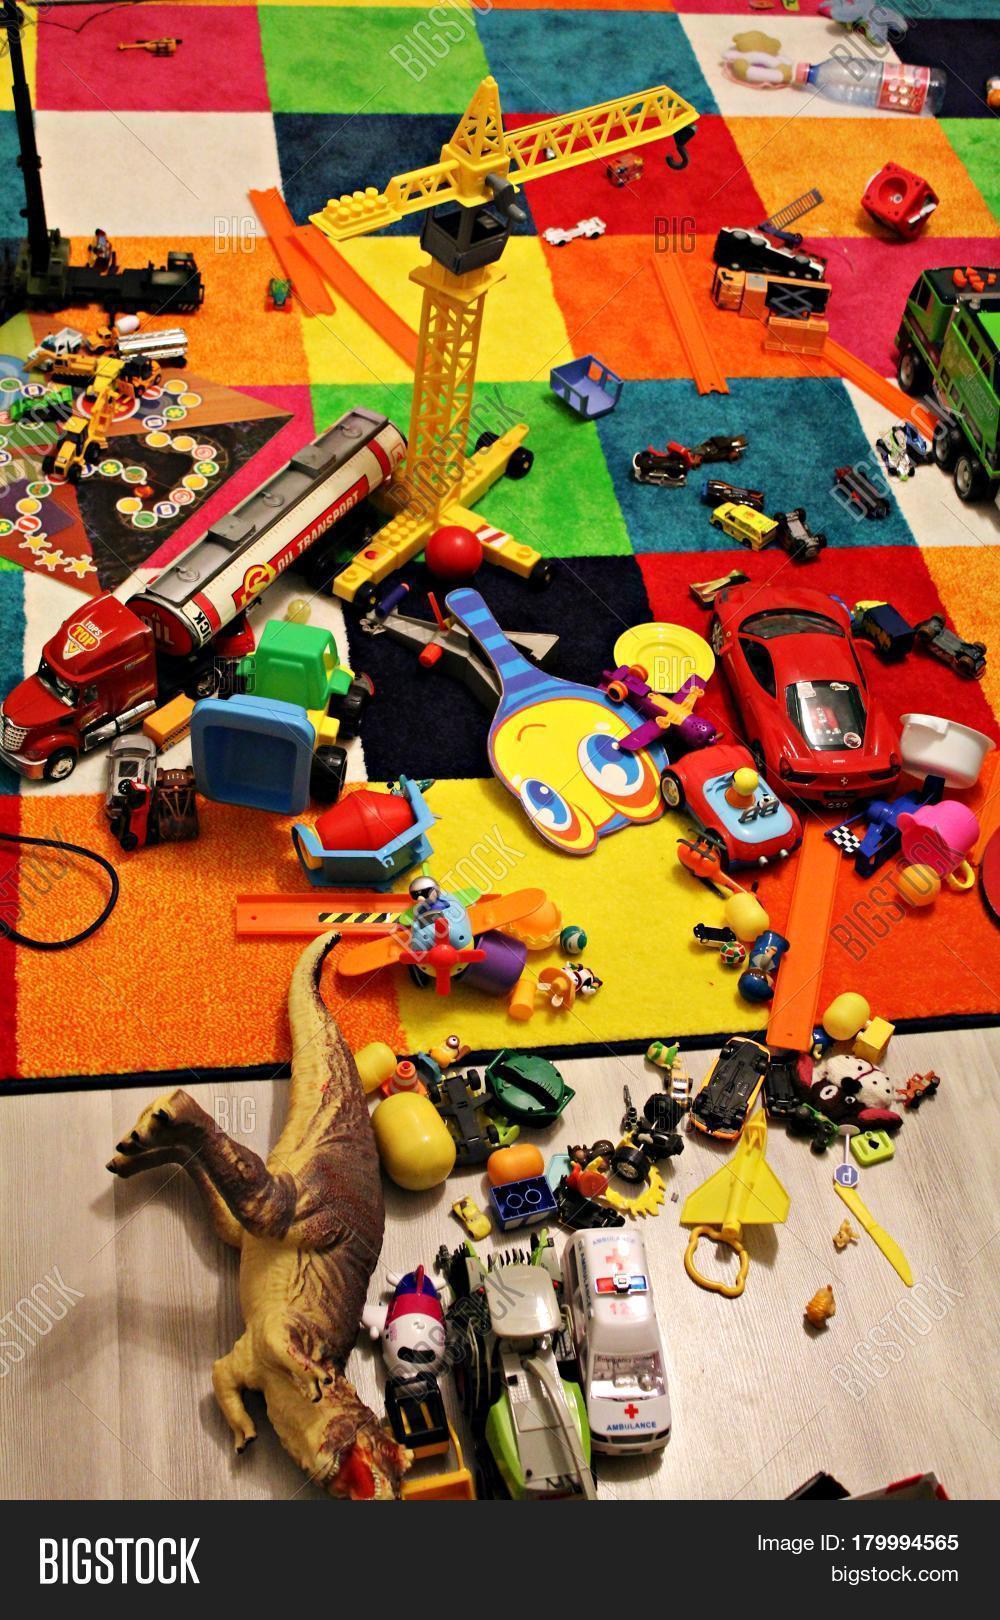 Messy Kids Room - Toys Image & Photo (Free Trial) | Bigstock